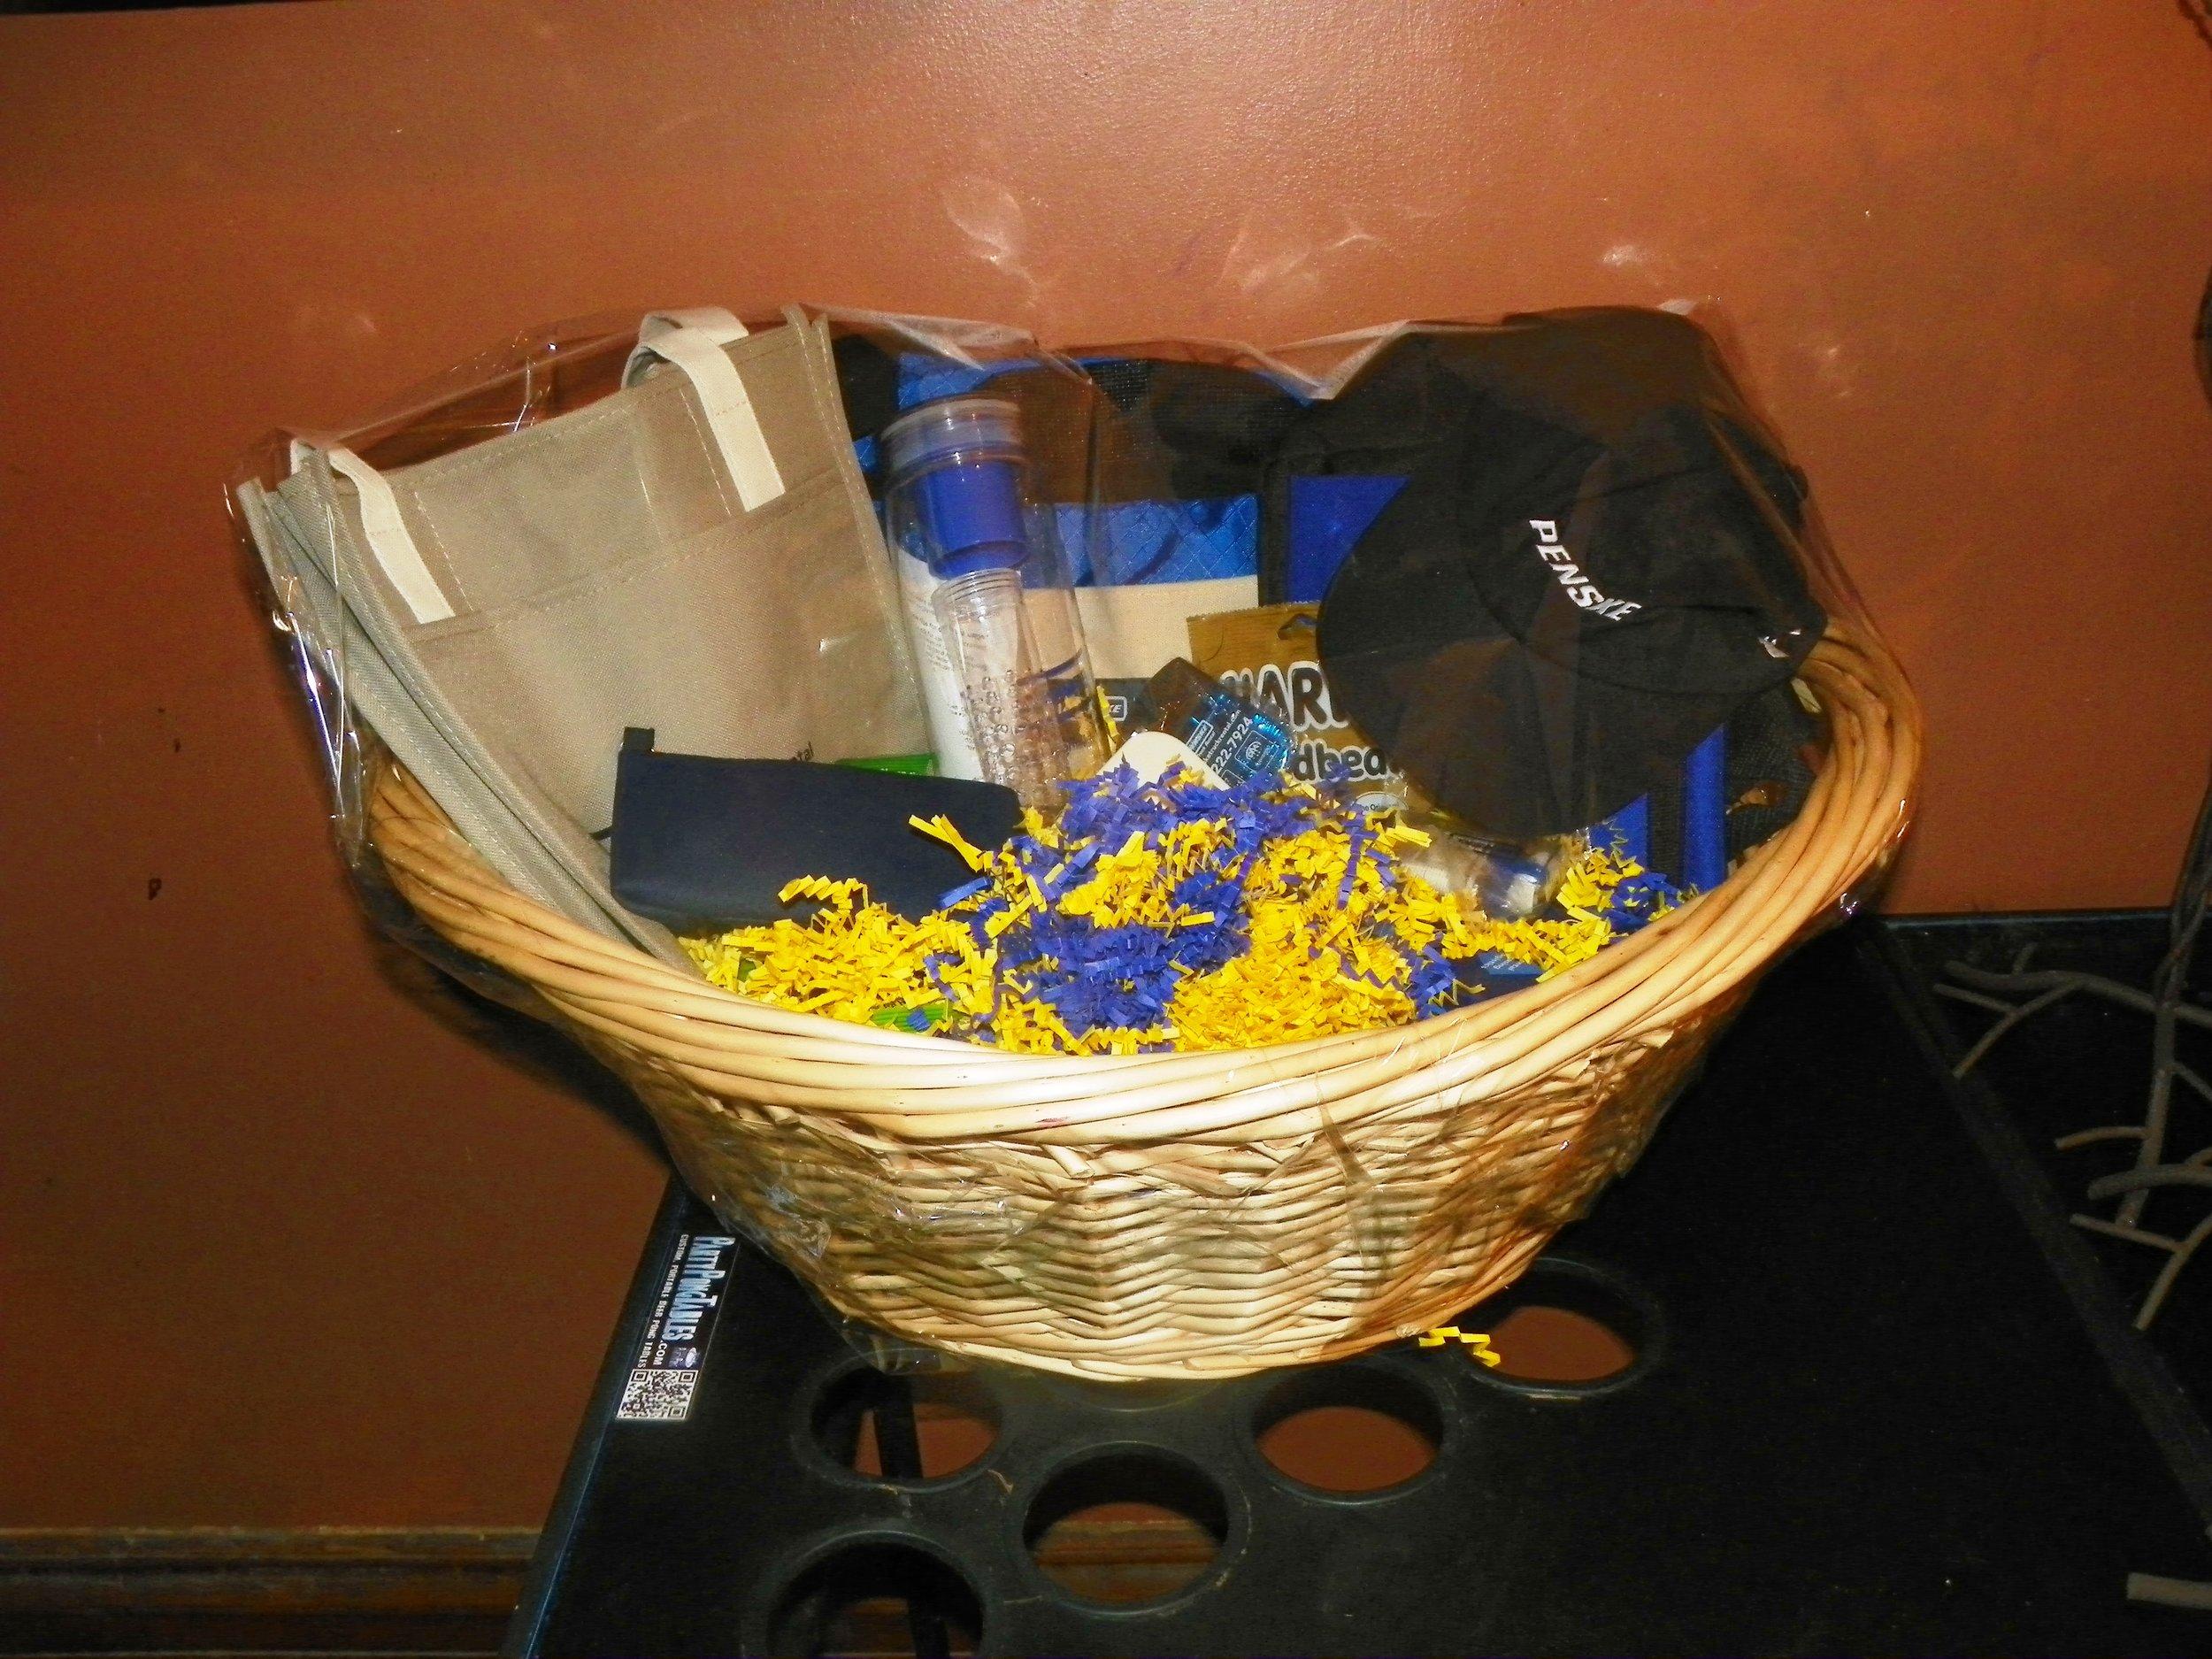 Penski basket - duffel bag, travel pouch, medium tote bag, water bottle, bag clip, fidget spinner, 2 ear buds,bubble lip balm, mints, hand sanitizer, and a phone pouch   - value of $75.00